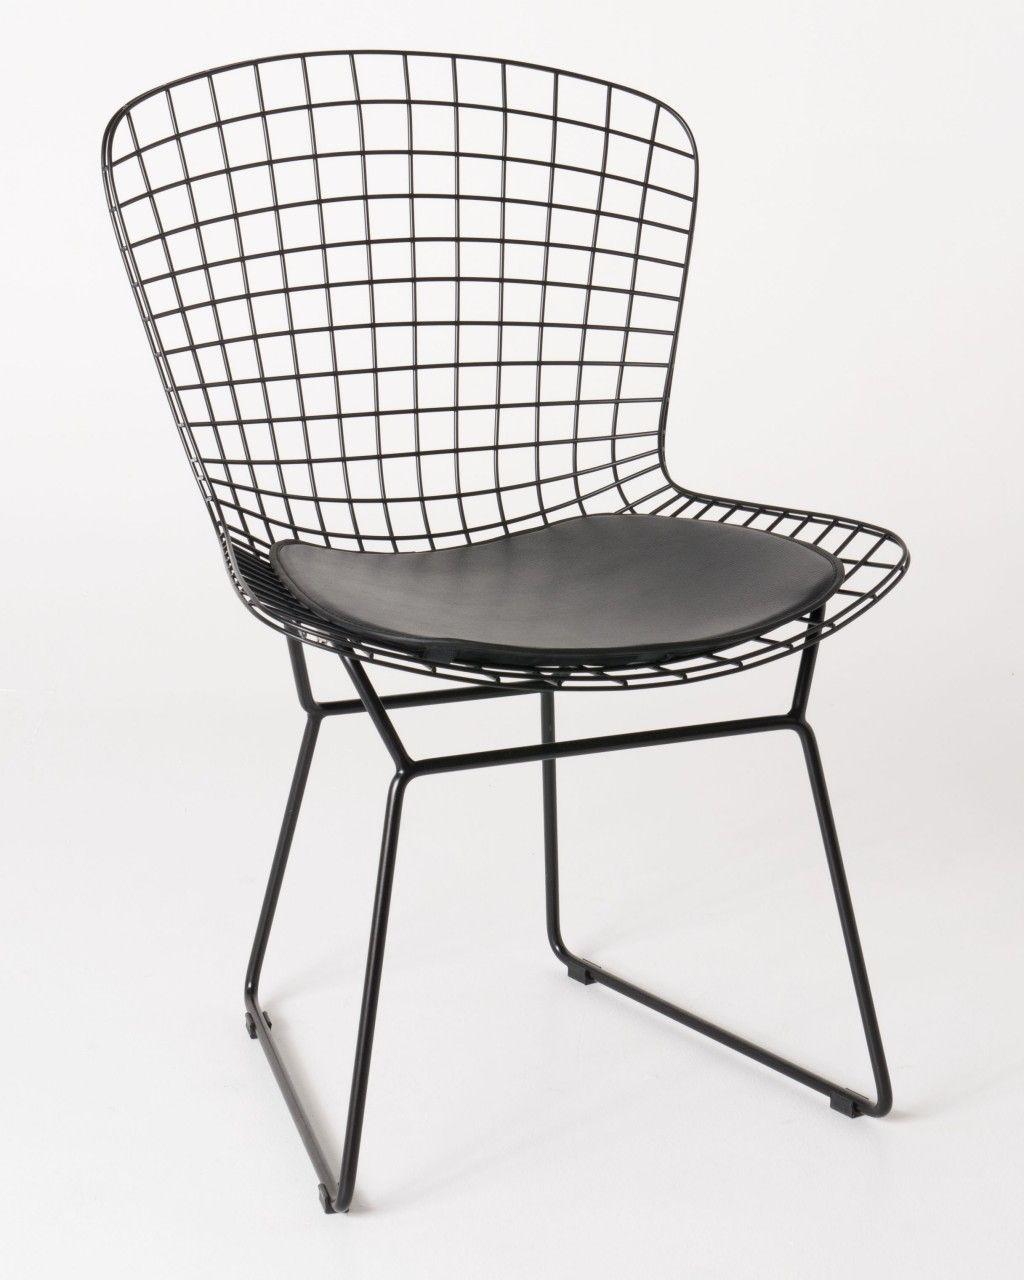 Attrayant Harry Bertoia Chairs   Compare Price Before You Buy. Replica Harry Bertoia  Bird ...